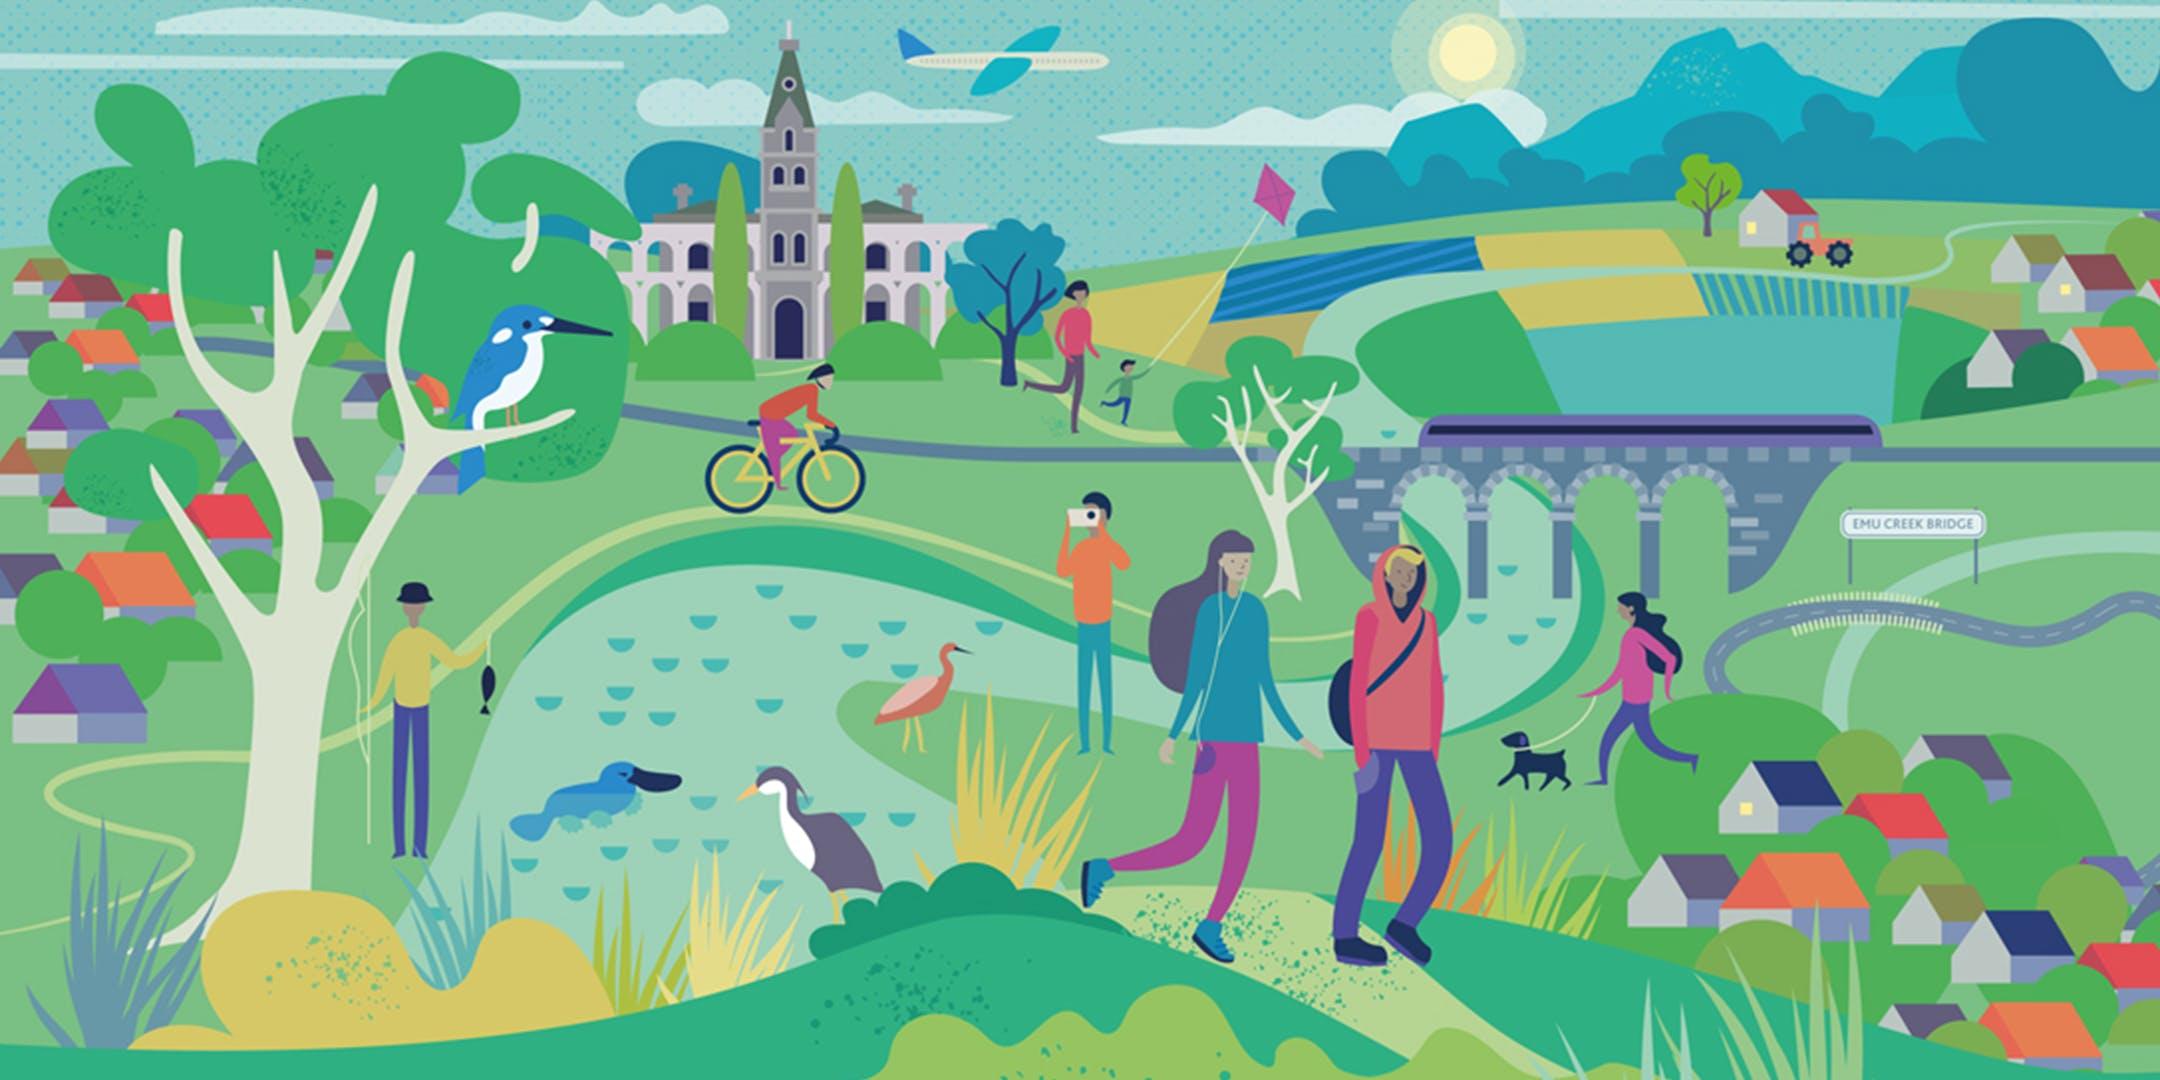 Sunbury's Water Future public workshop